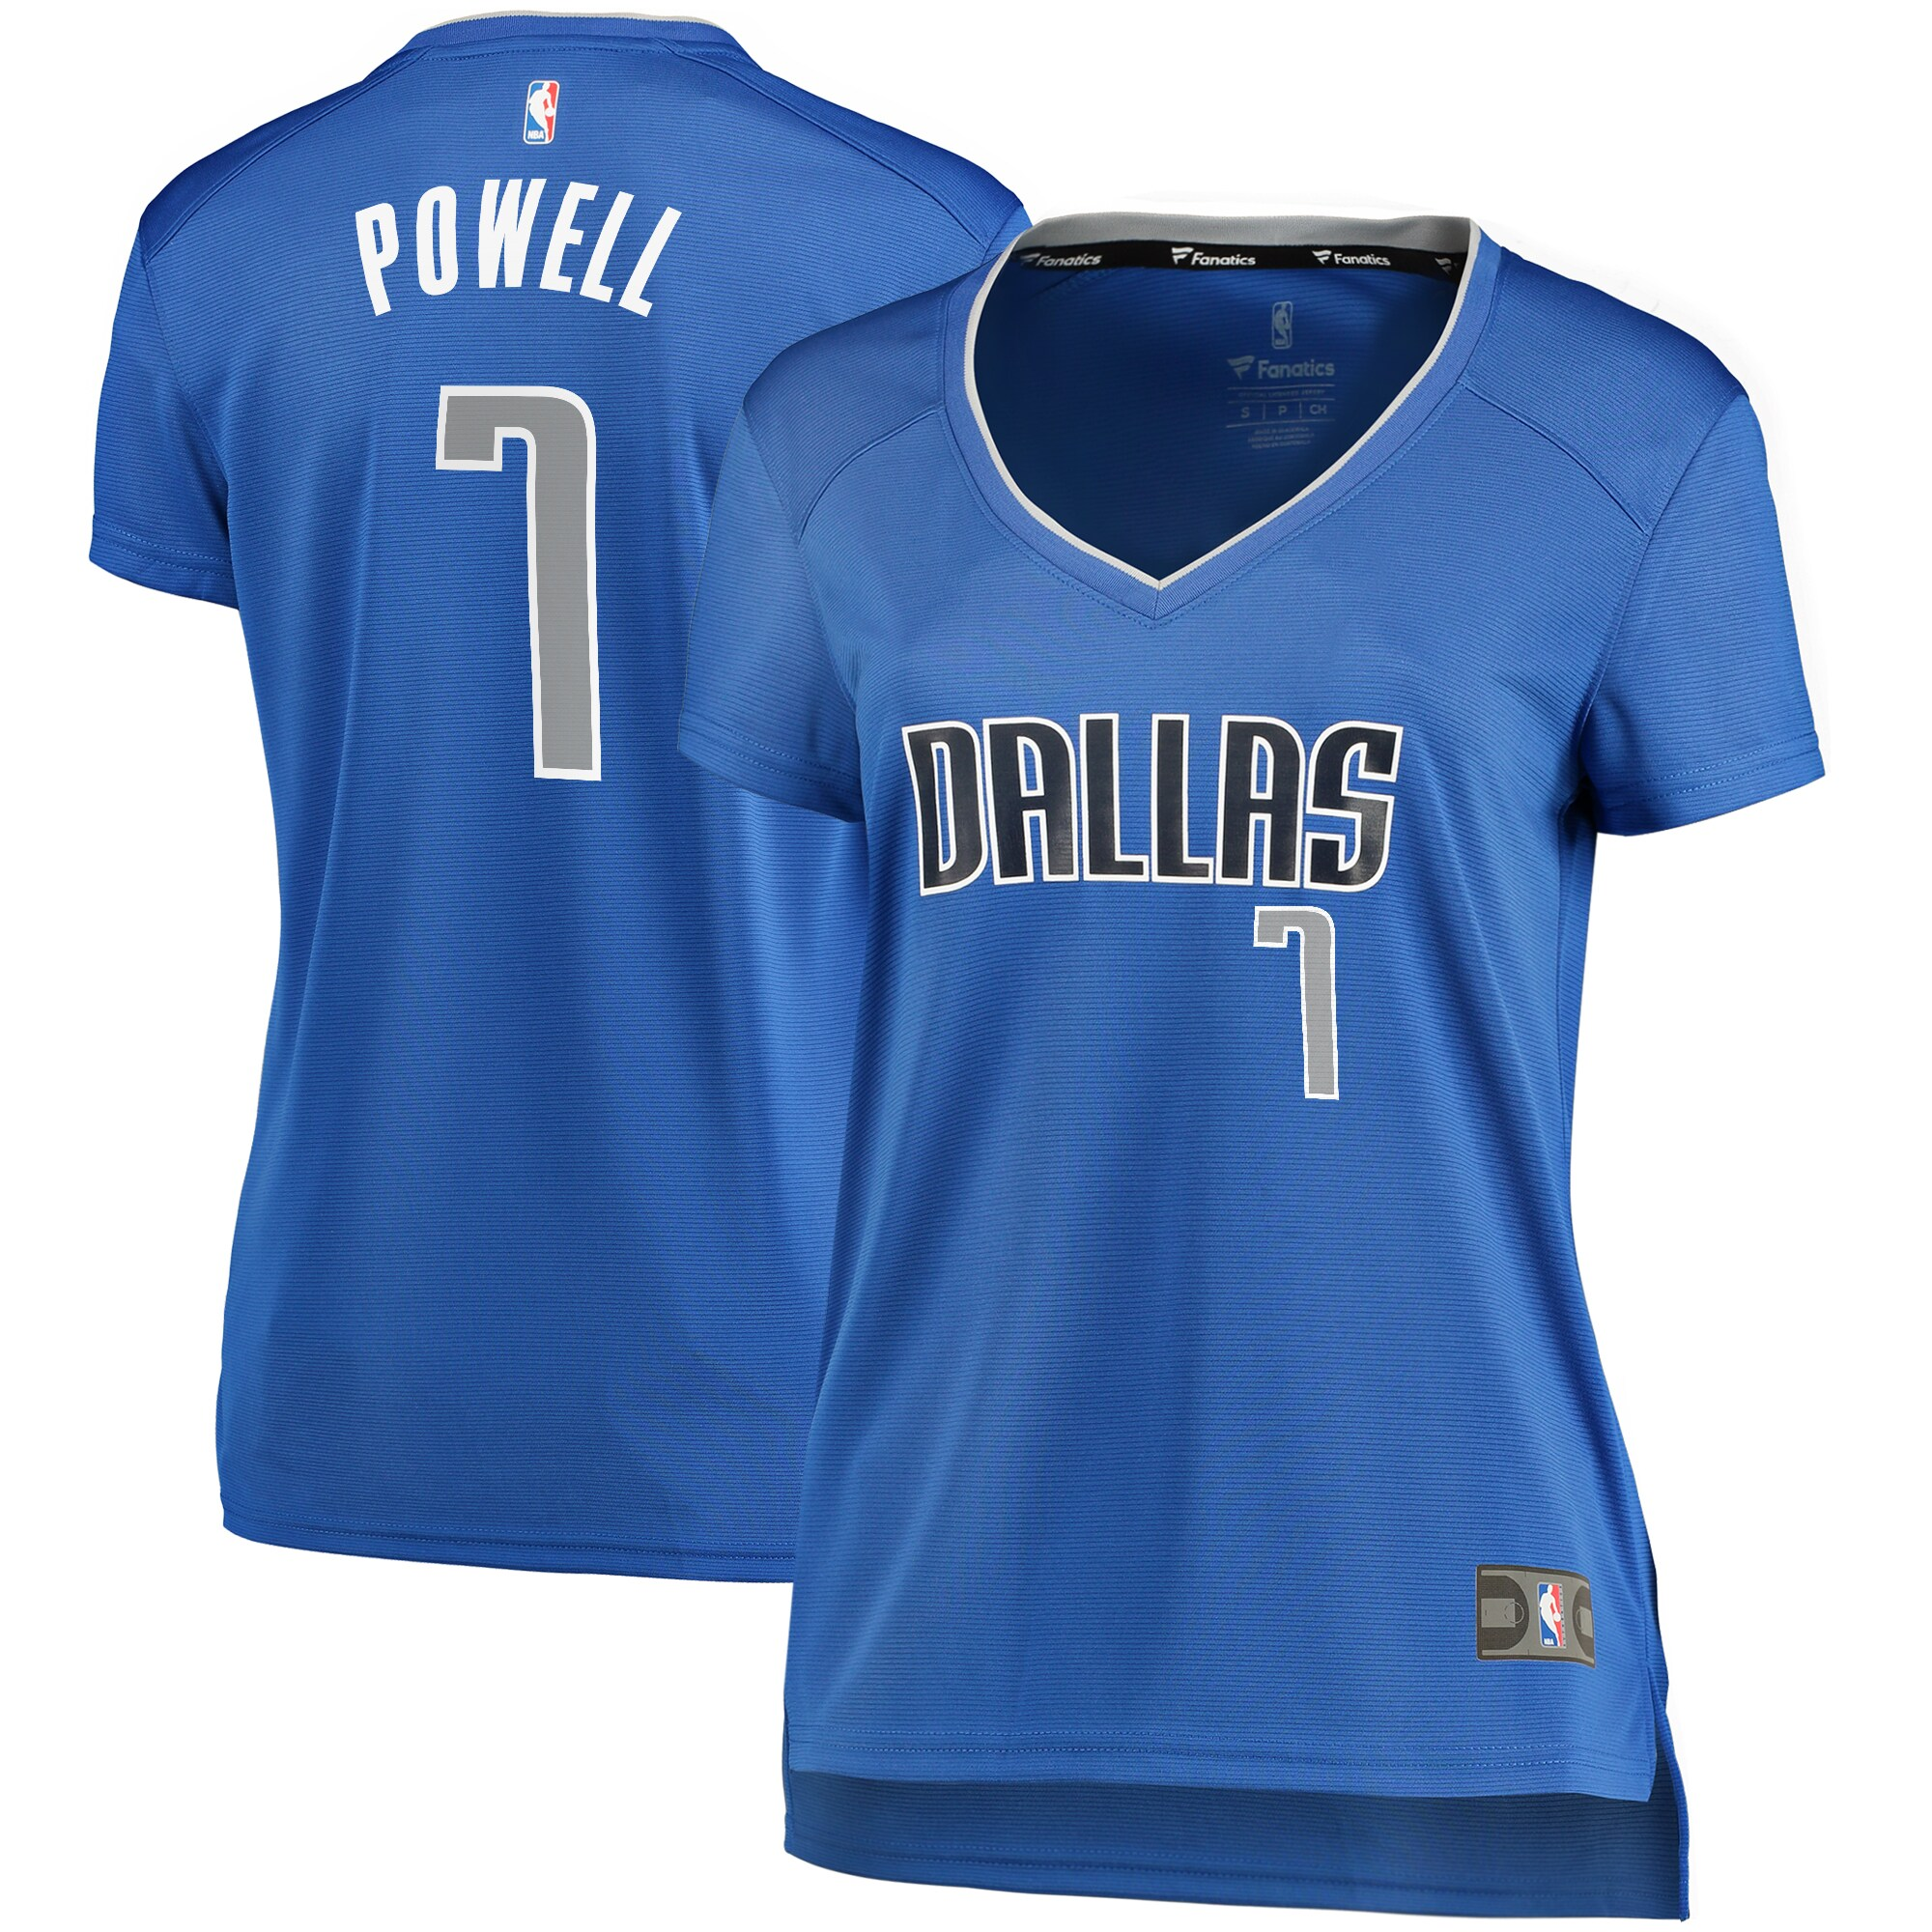 Dwight Powell Dallas Mavericks Fanatics Branded Women's Fast Break Player Replica Jersey - Icon Edition - Blue